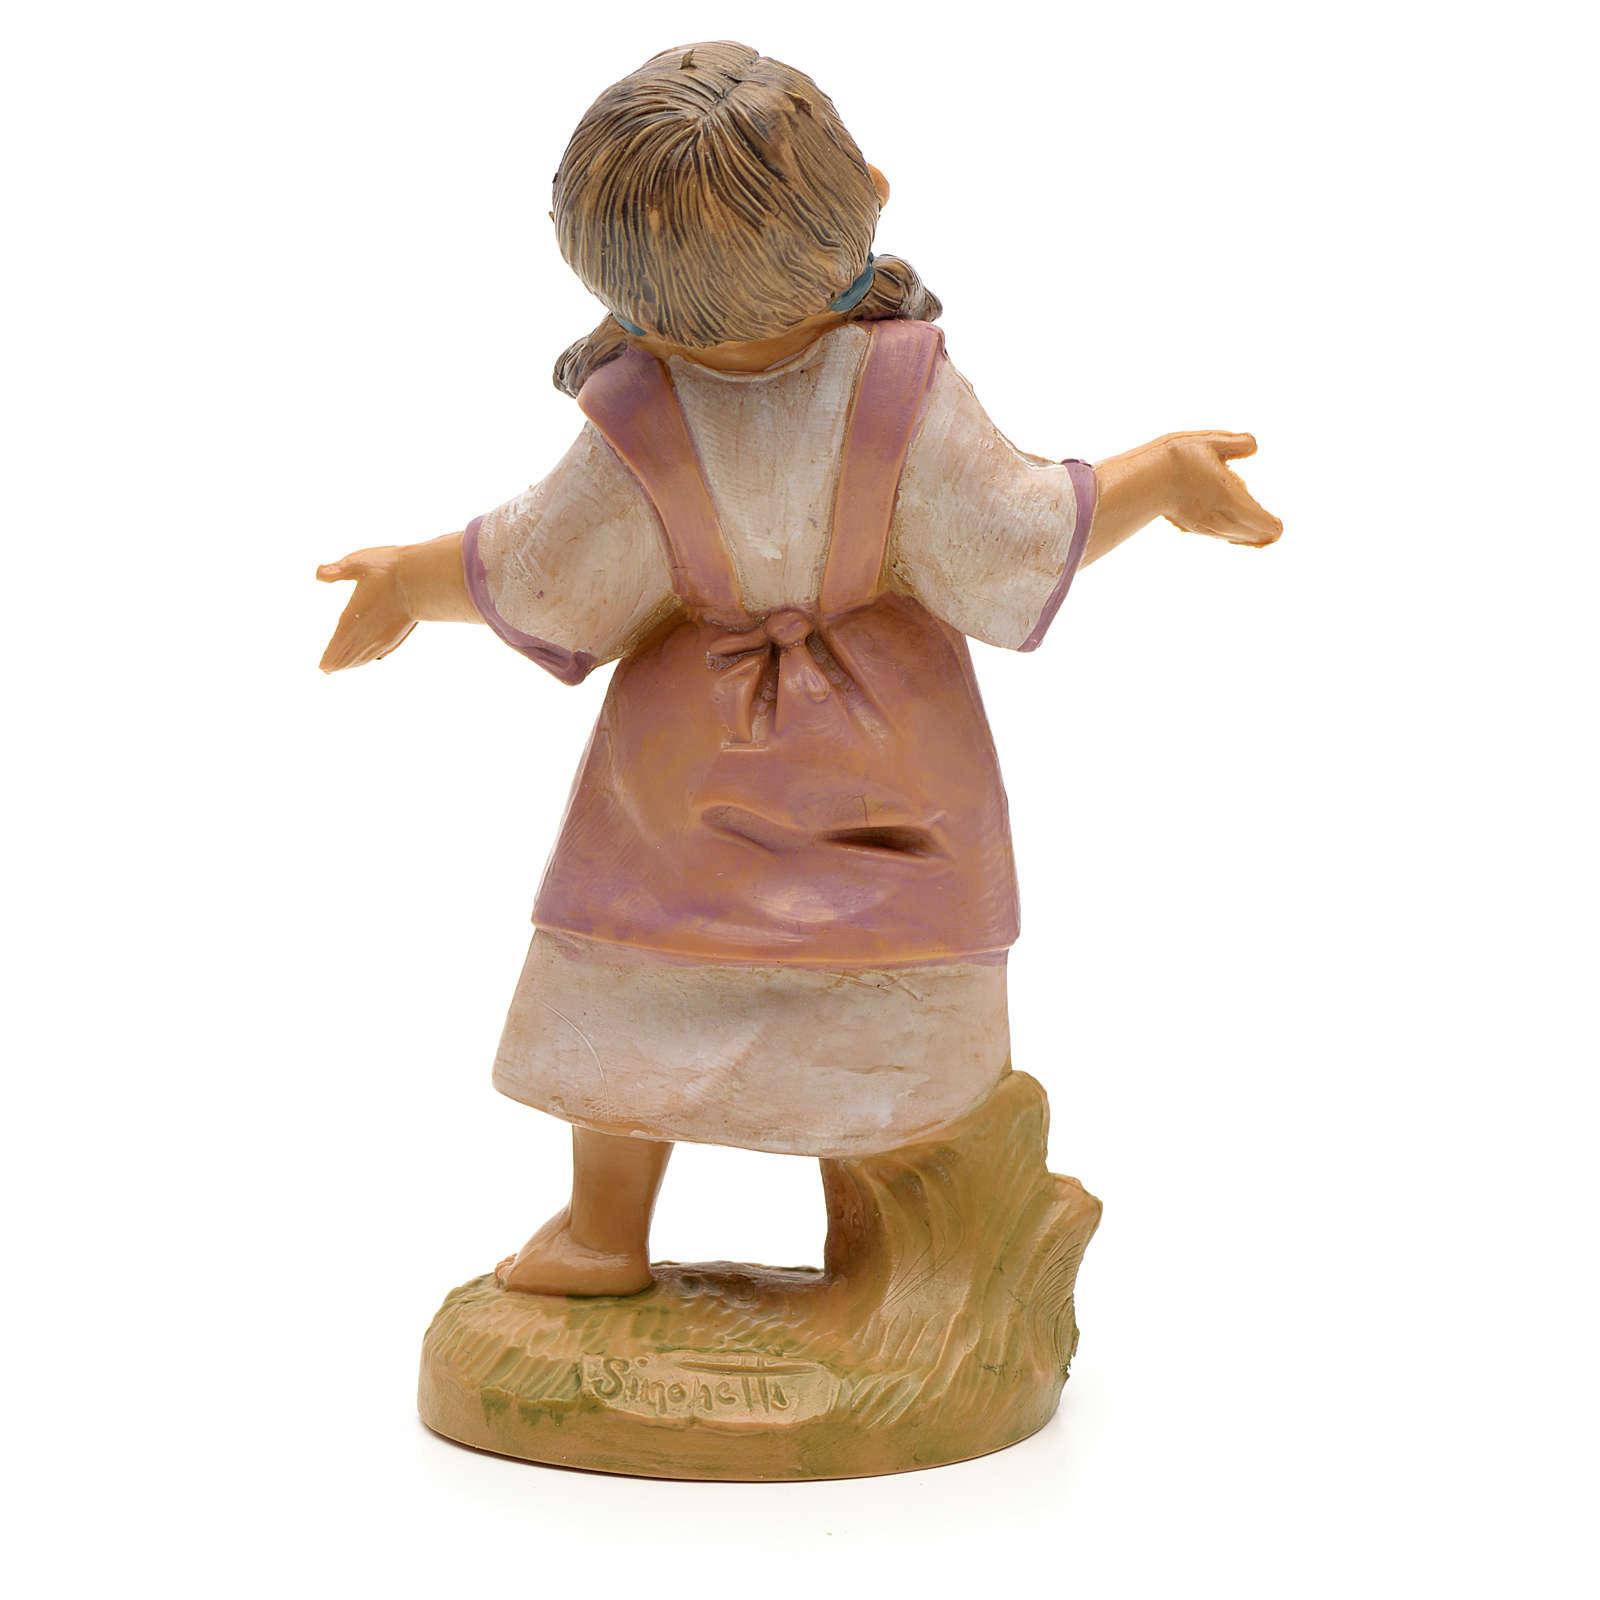 Bambina presepe Fontanini 19 cm 3